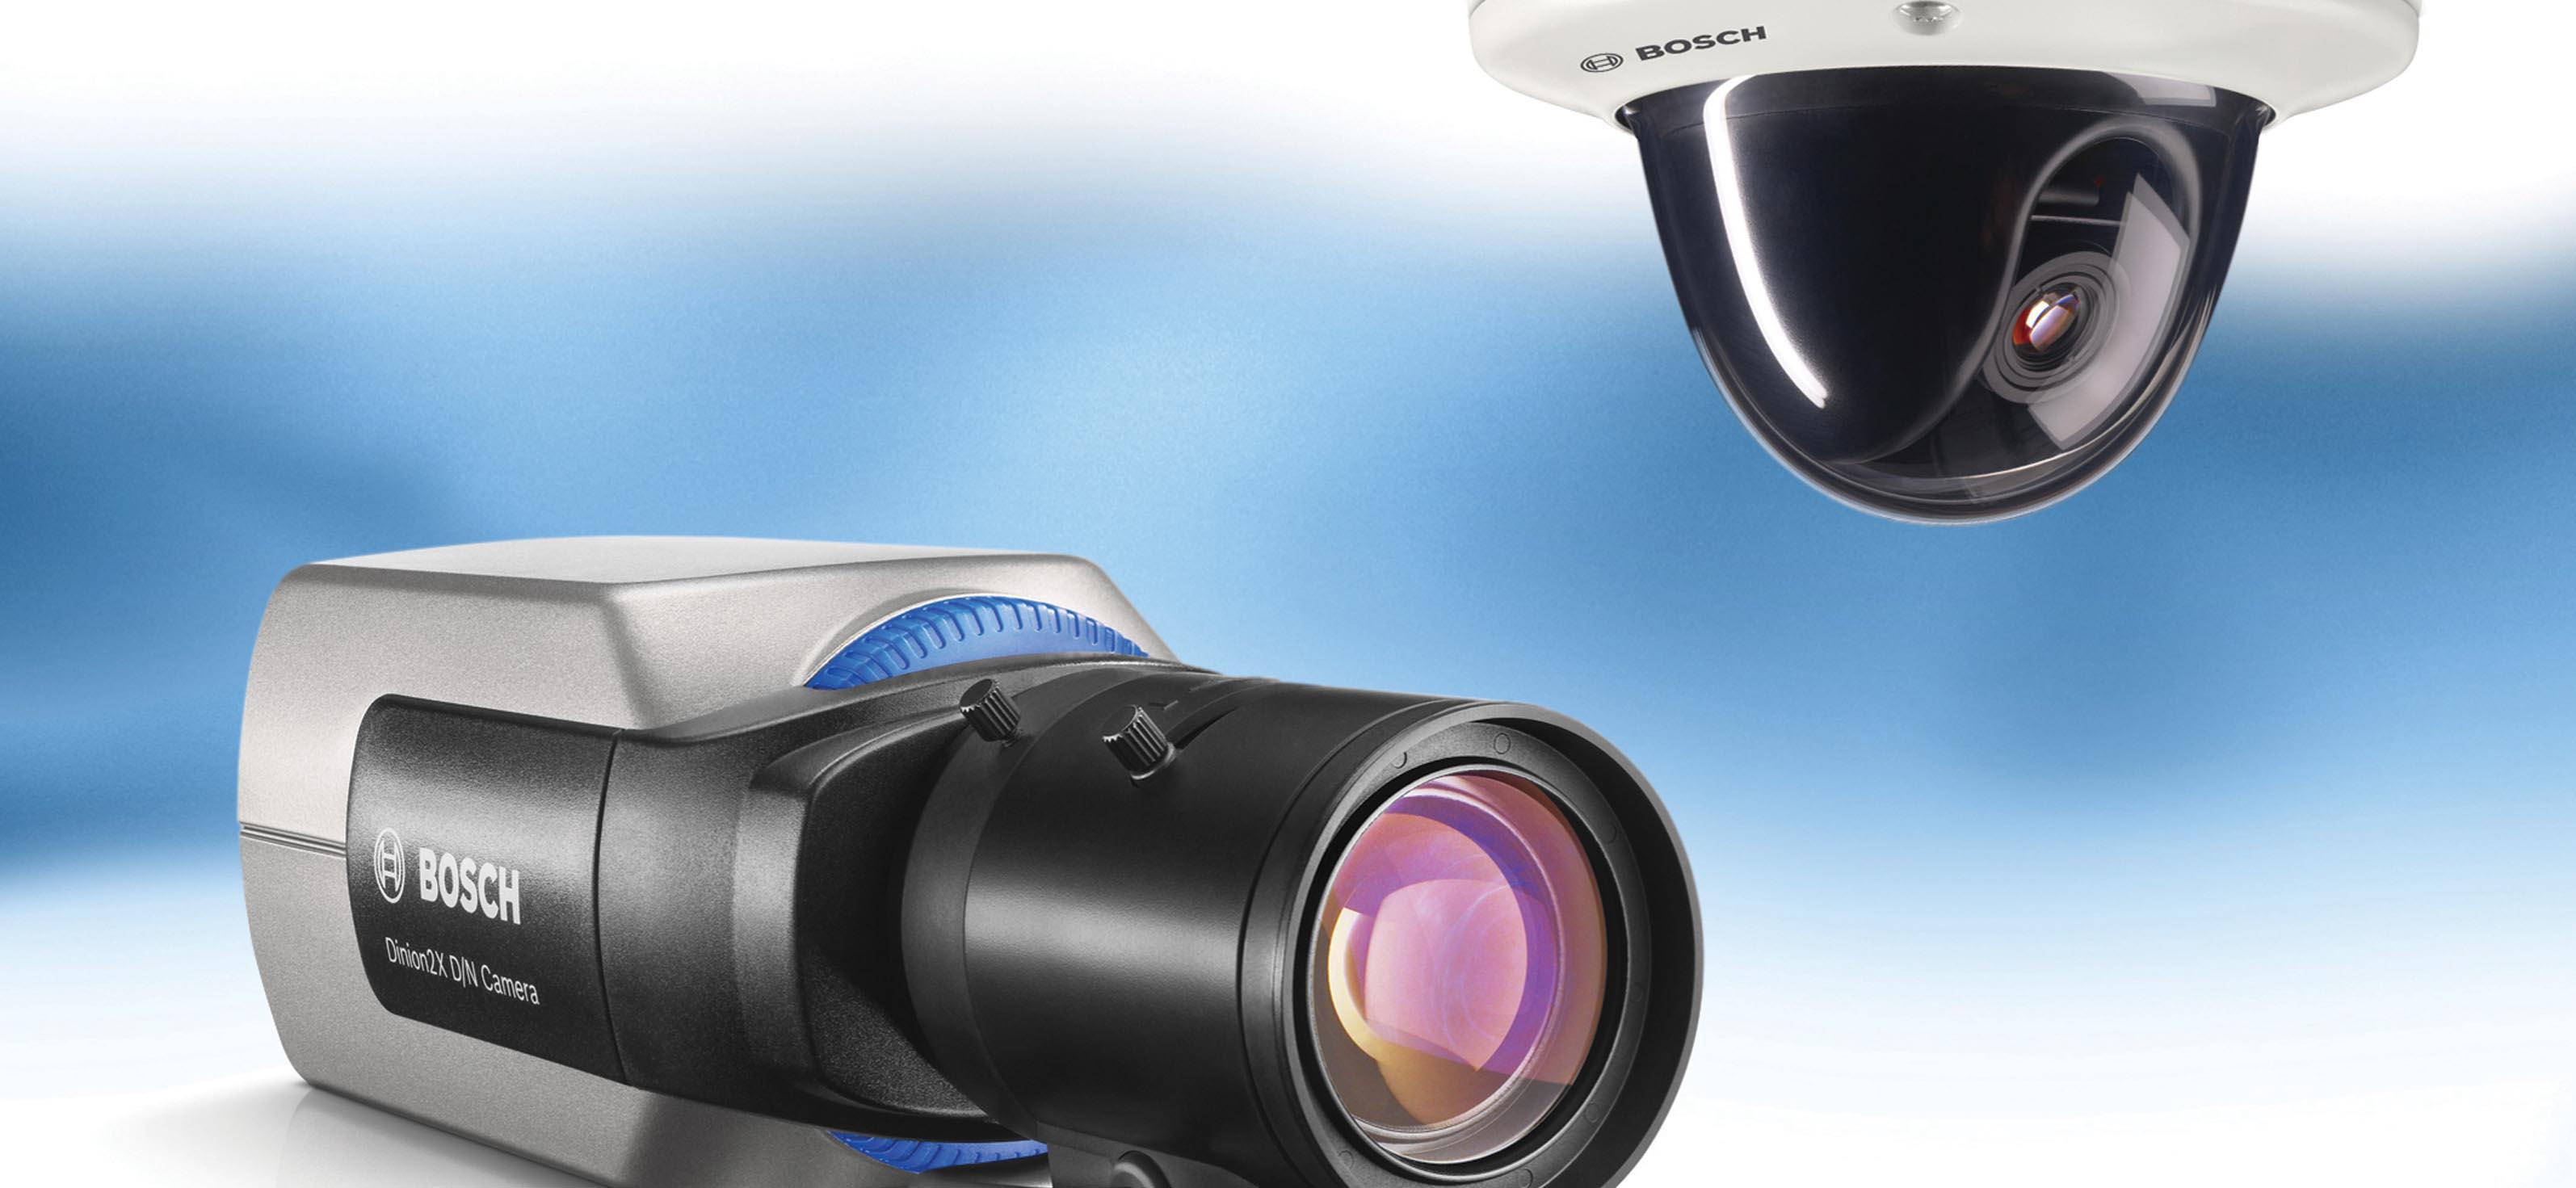 Security cameras: Seeing is believing